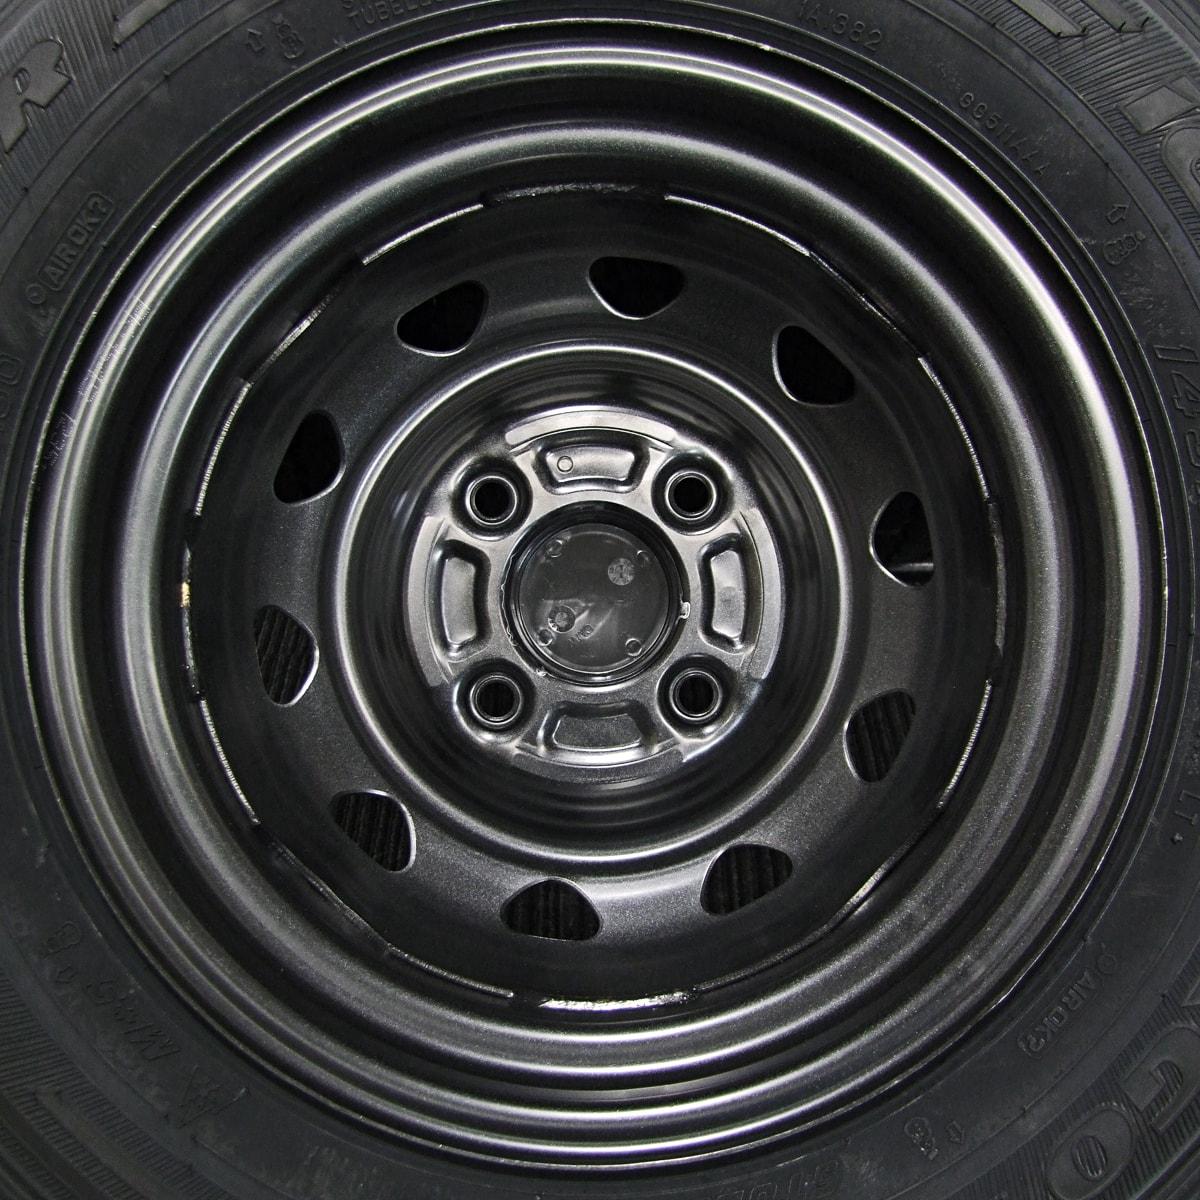 WEDS CARROWIN シルバースチール GOODYEAR ICE NAVI CARGO 145R12LT 6PR 4本SET